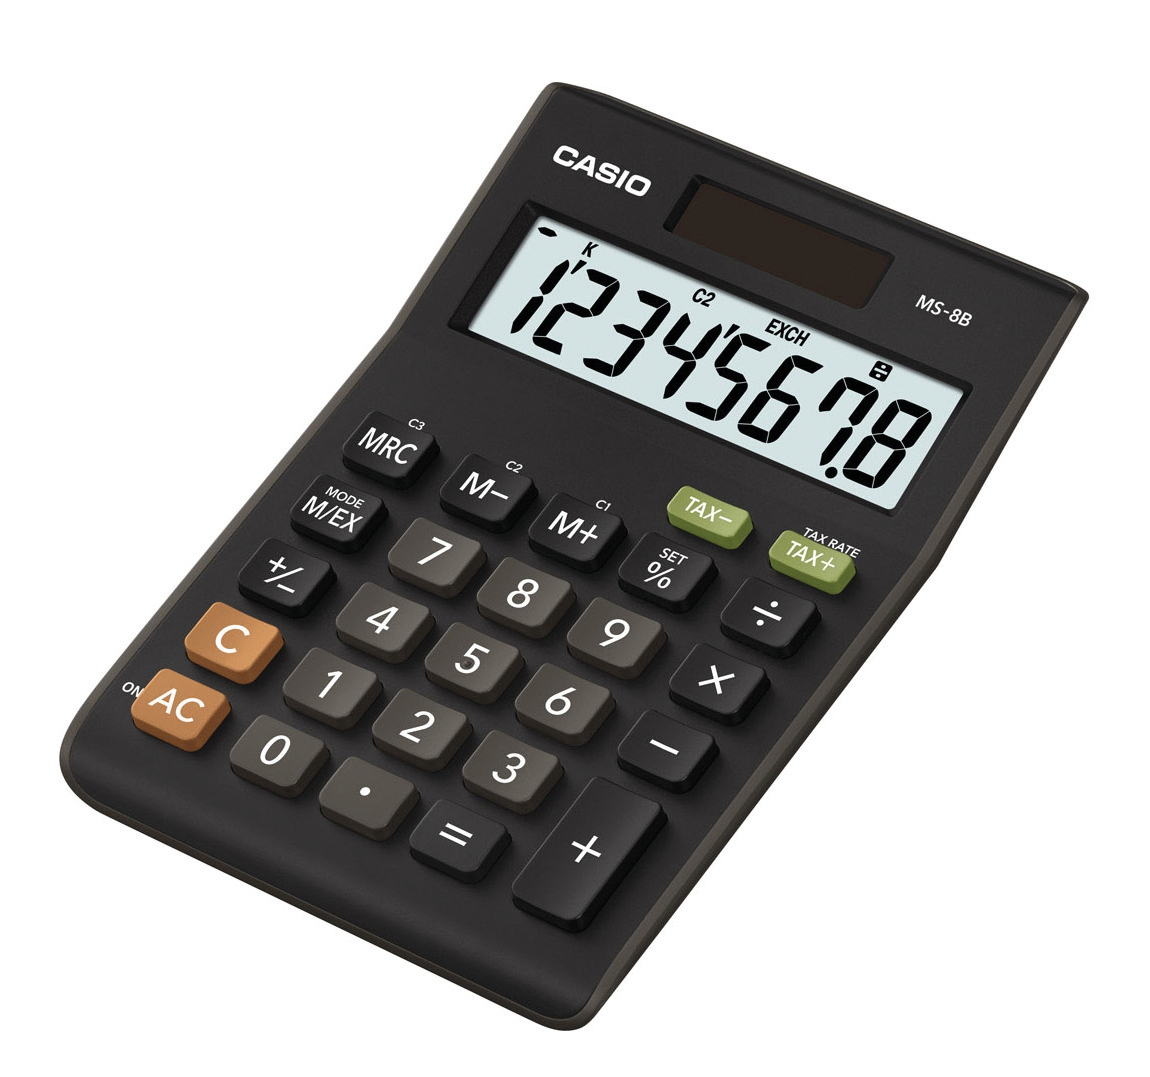 Casio Calculator Desktop Battery/Solar-power 8 Digit 3 Key Memory 103x137x31mm Black Ref MS-8TV/MS-8B